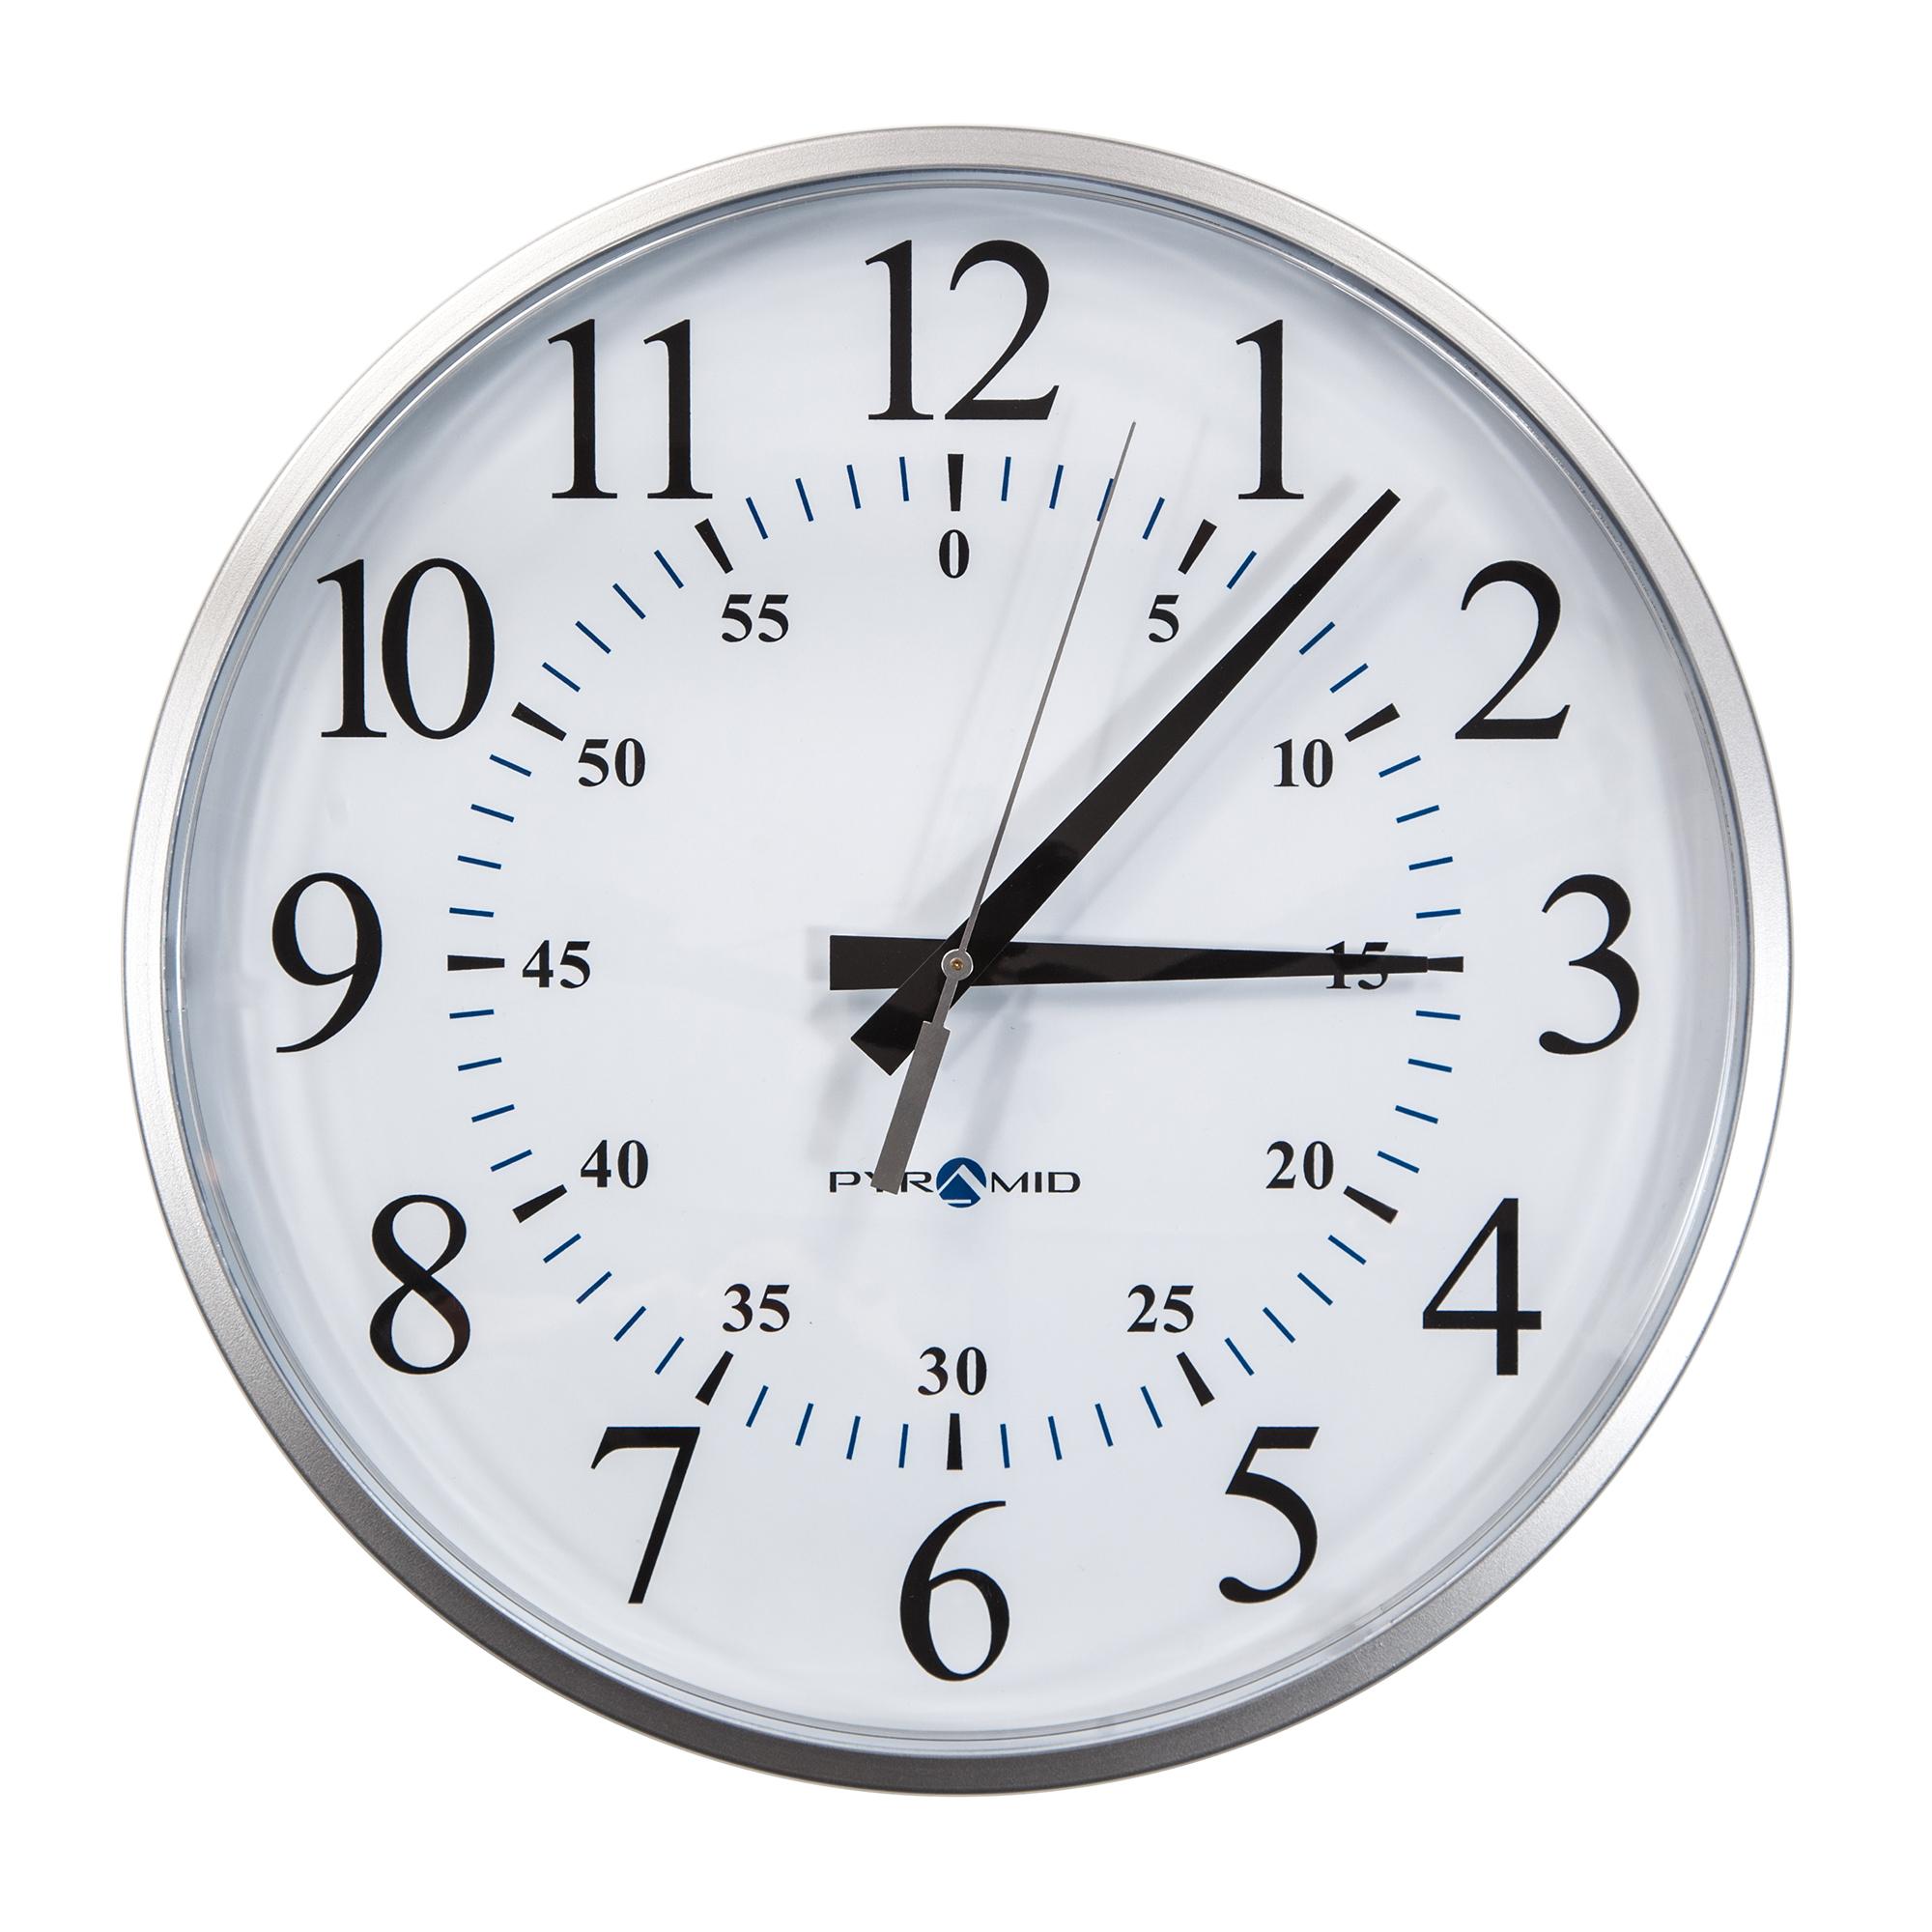 wireless clocks associated time parking controls